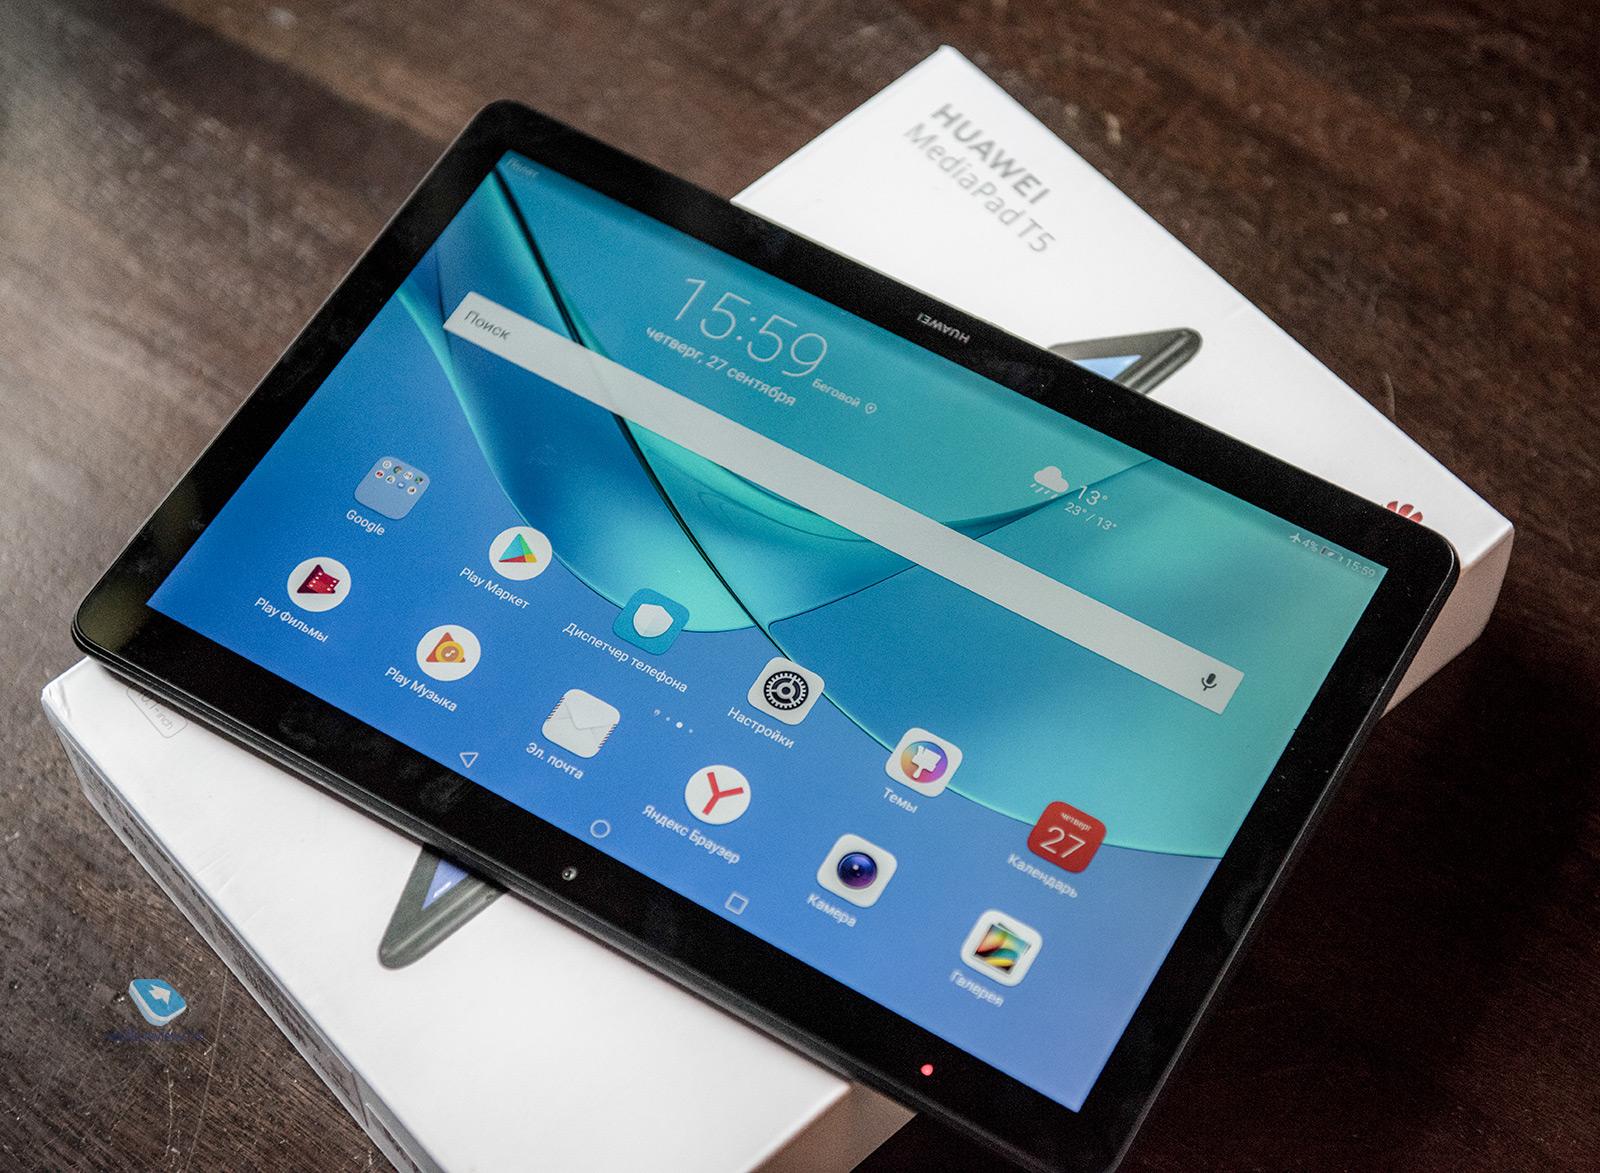 Обзор бюджетного планшета Samsung Galaxy Tab 10.1 2019 (SM-T510/SM-T515)